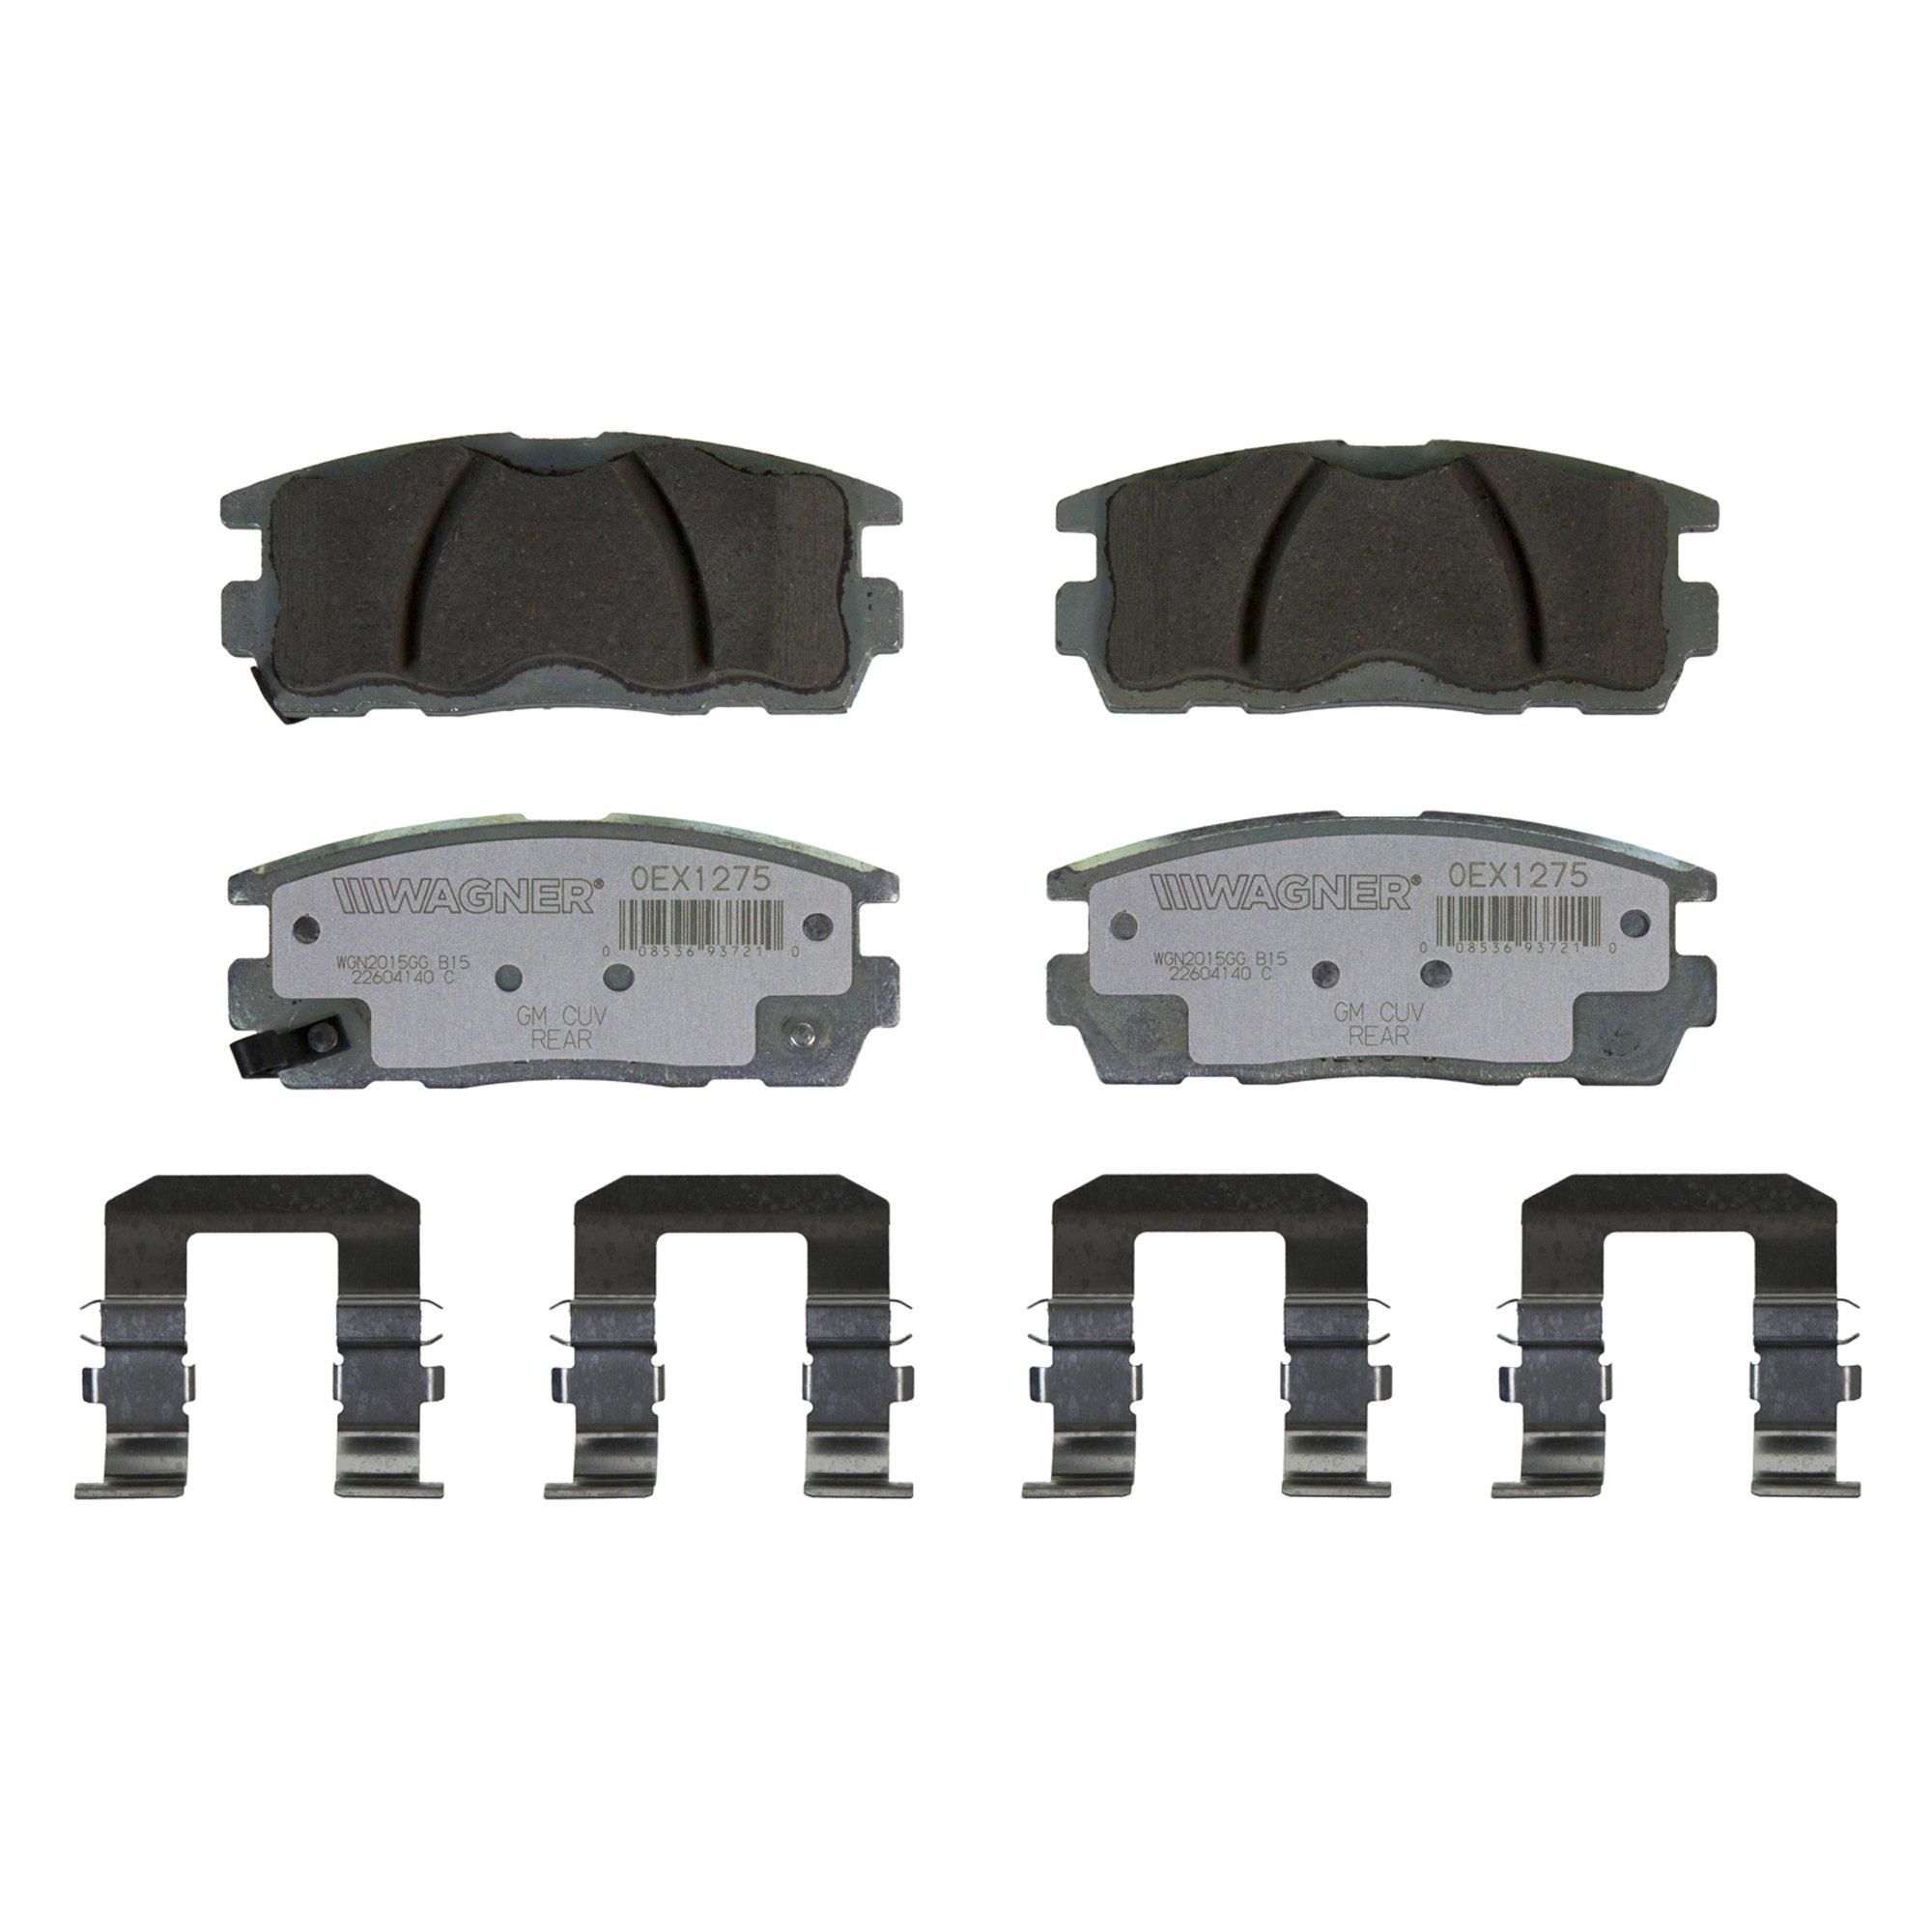 Details about Wagner OEx Ceramic Disc Brake Pad Set OEX1275